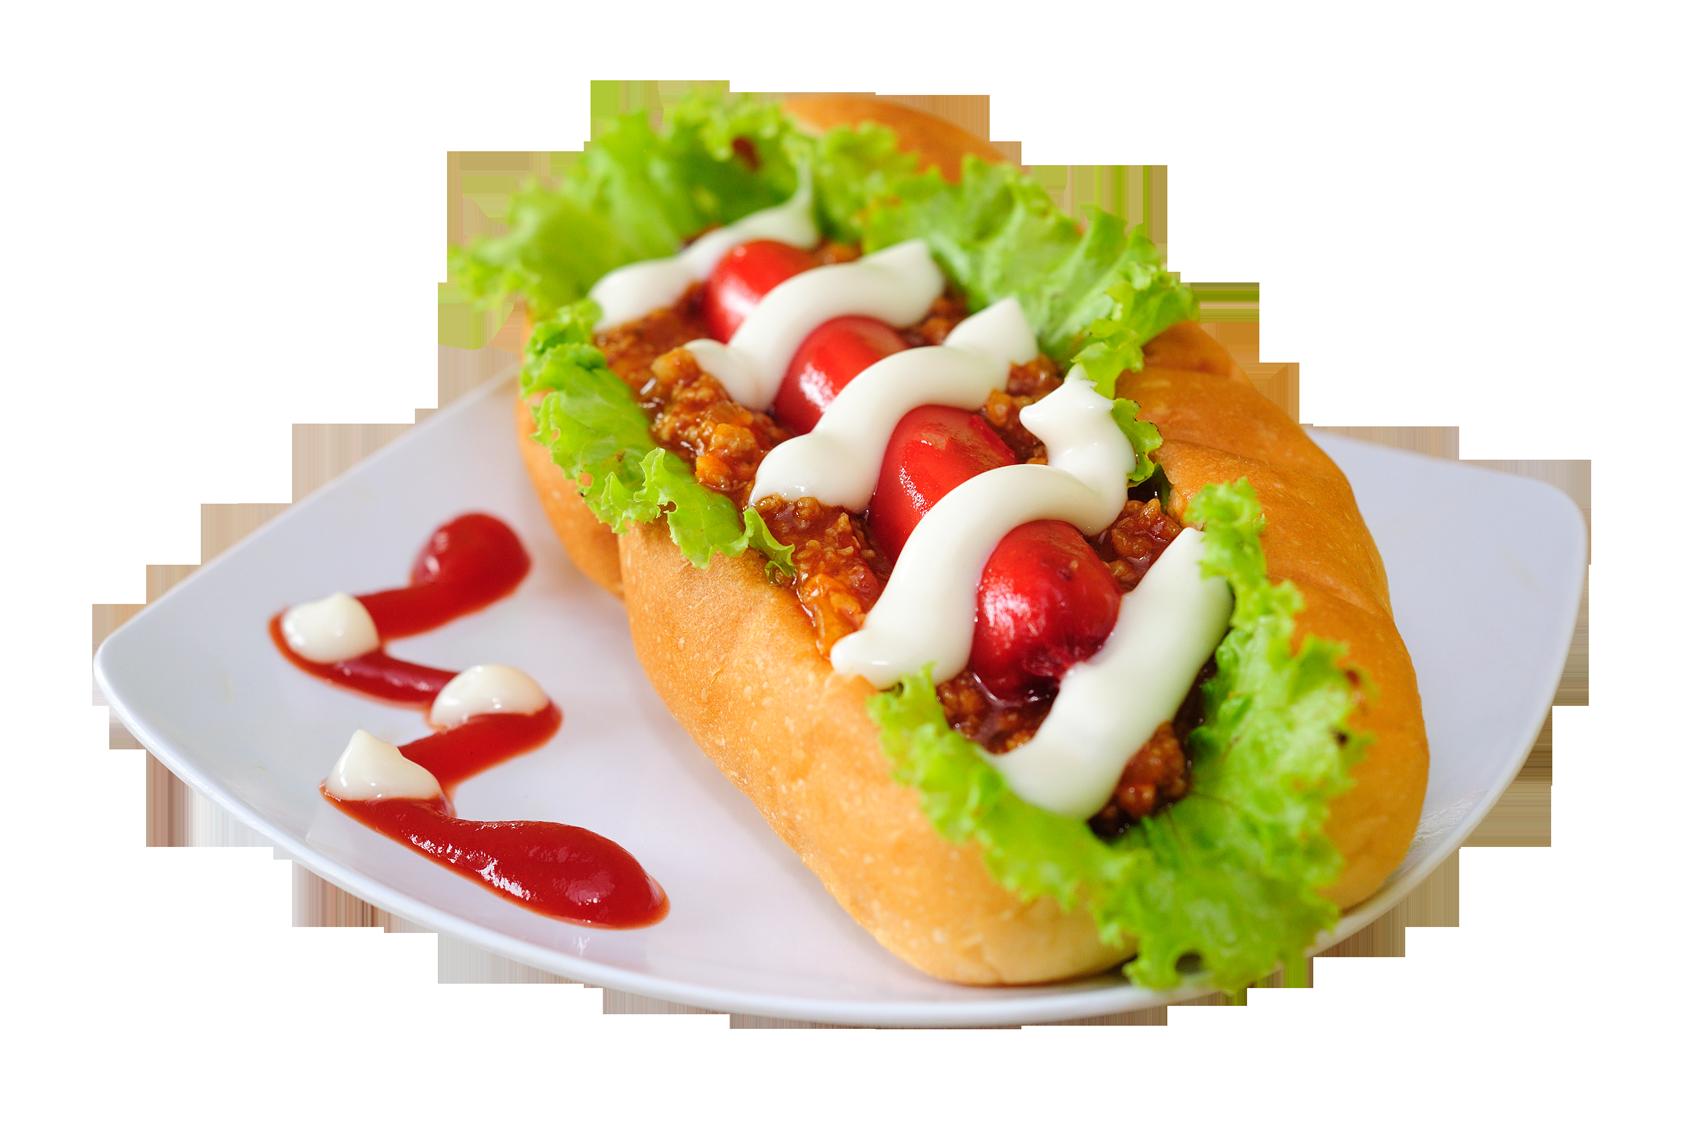 Hd Hot Dogs